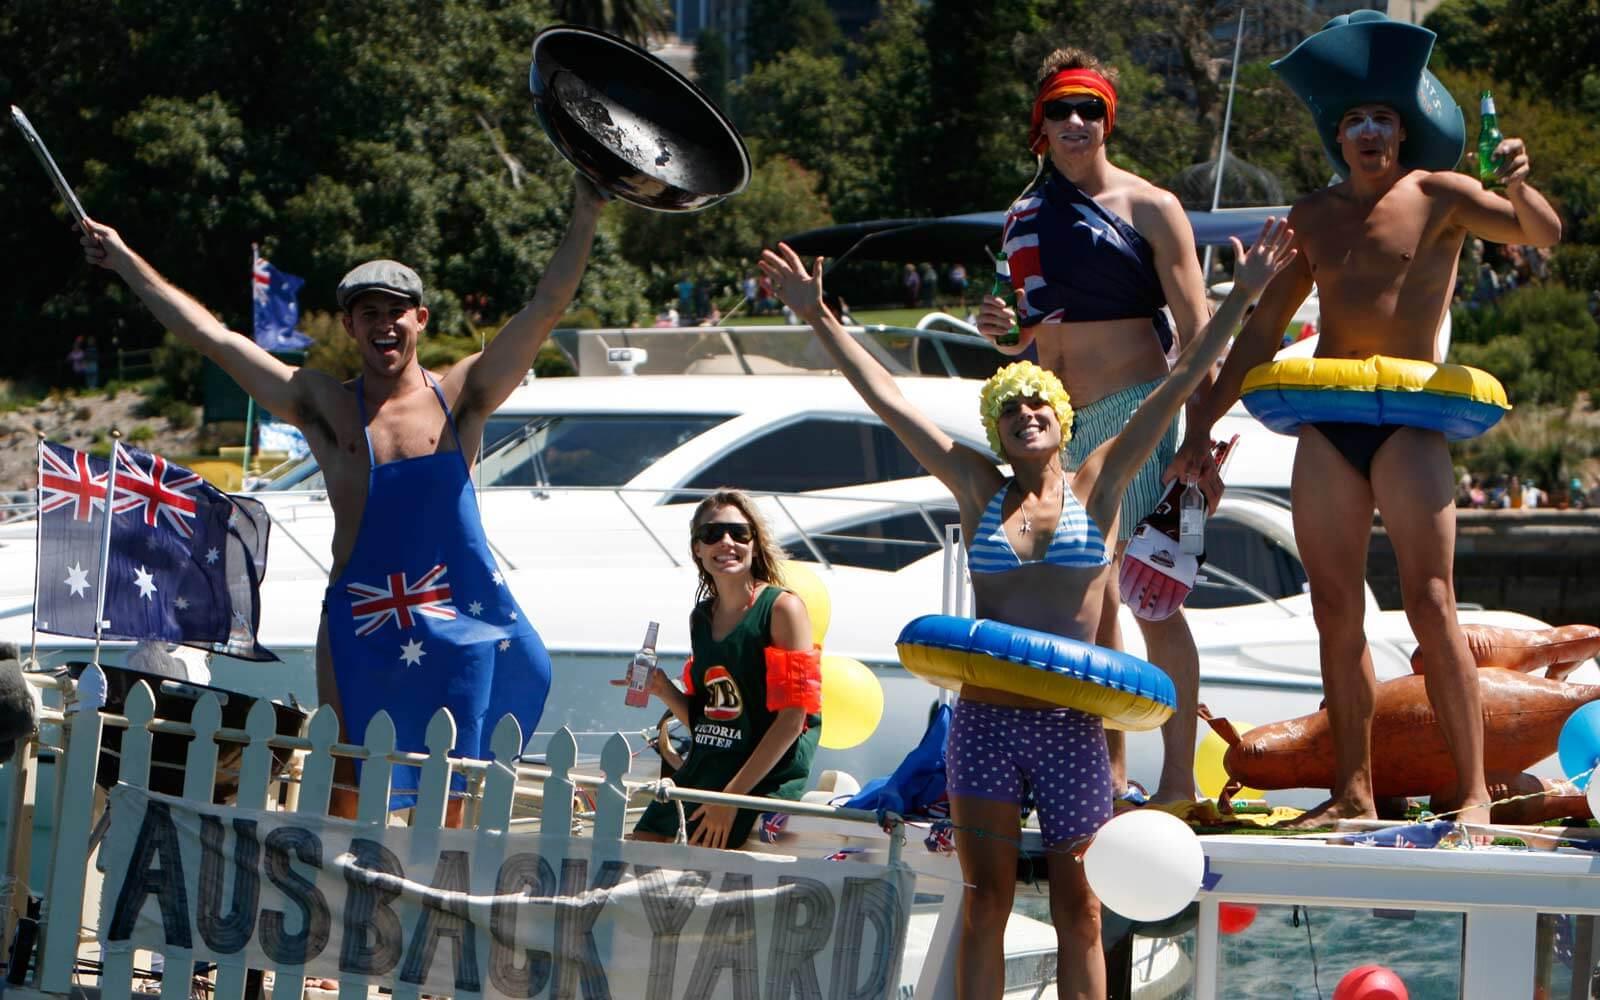 Australia Day: Partypeople